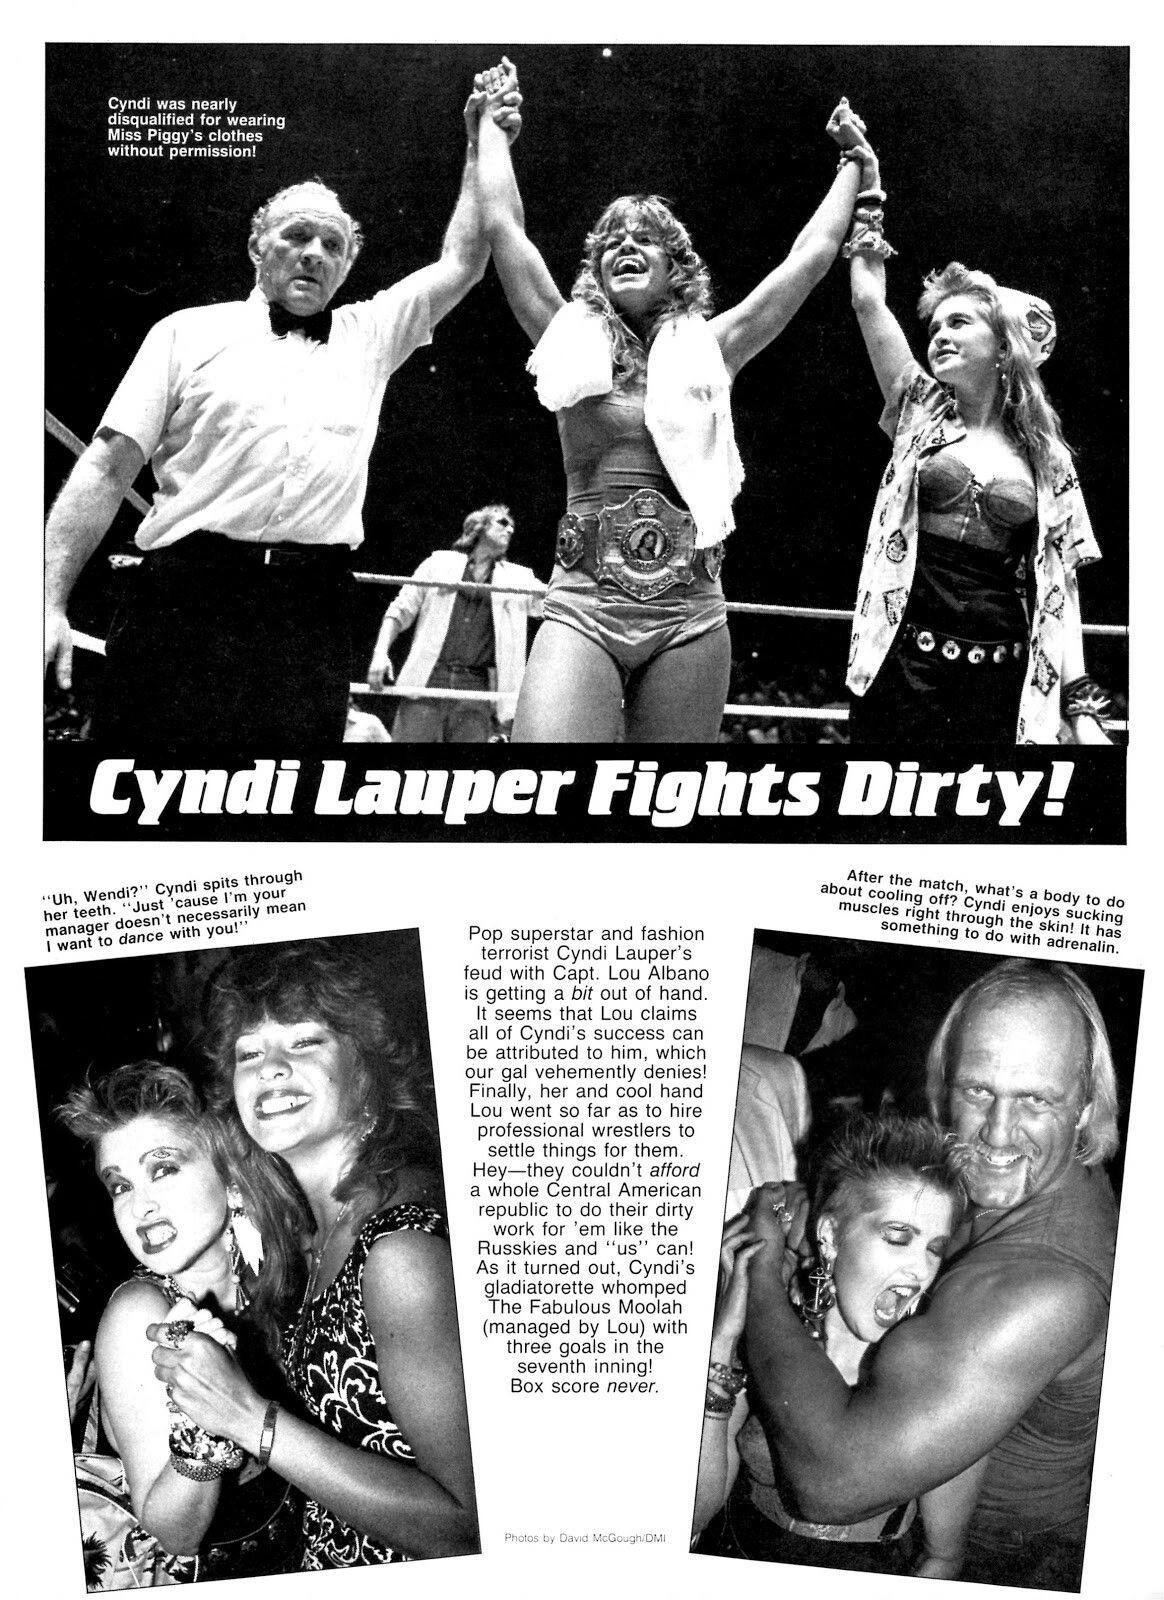 Cyn, Wendi Richter, Hulk Hogan